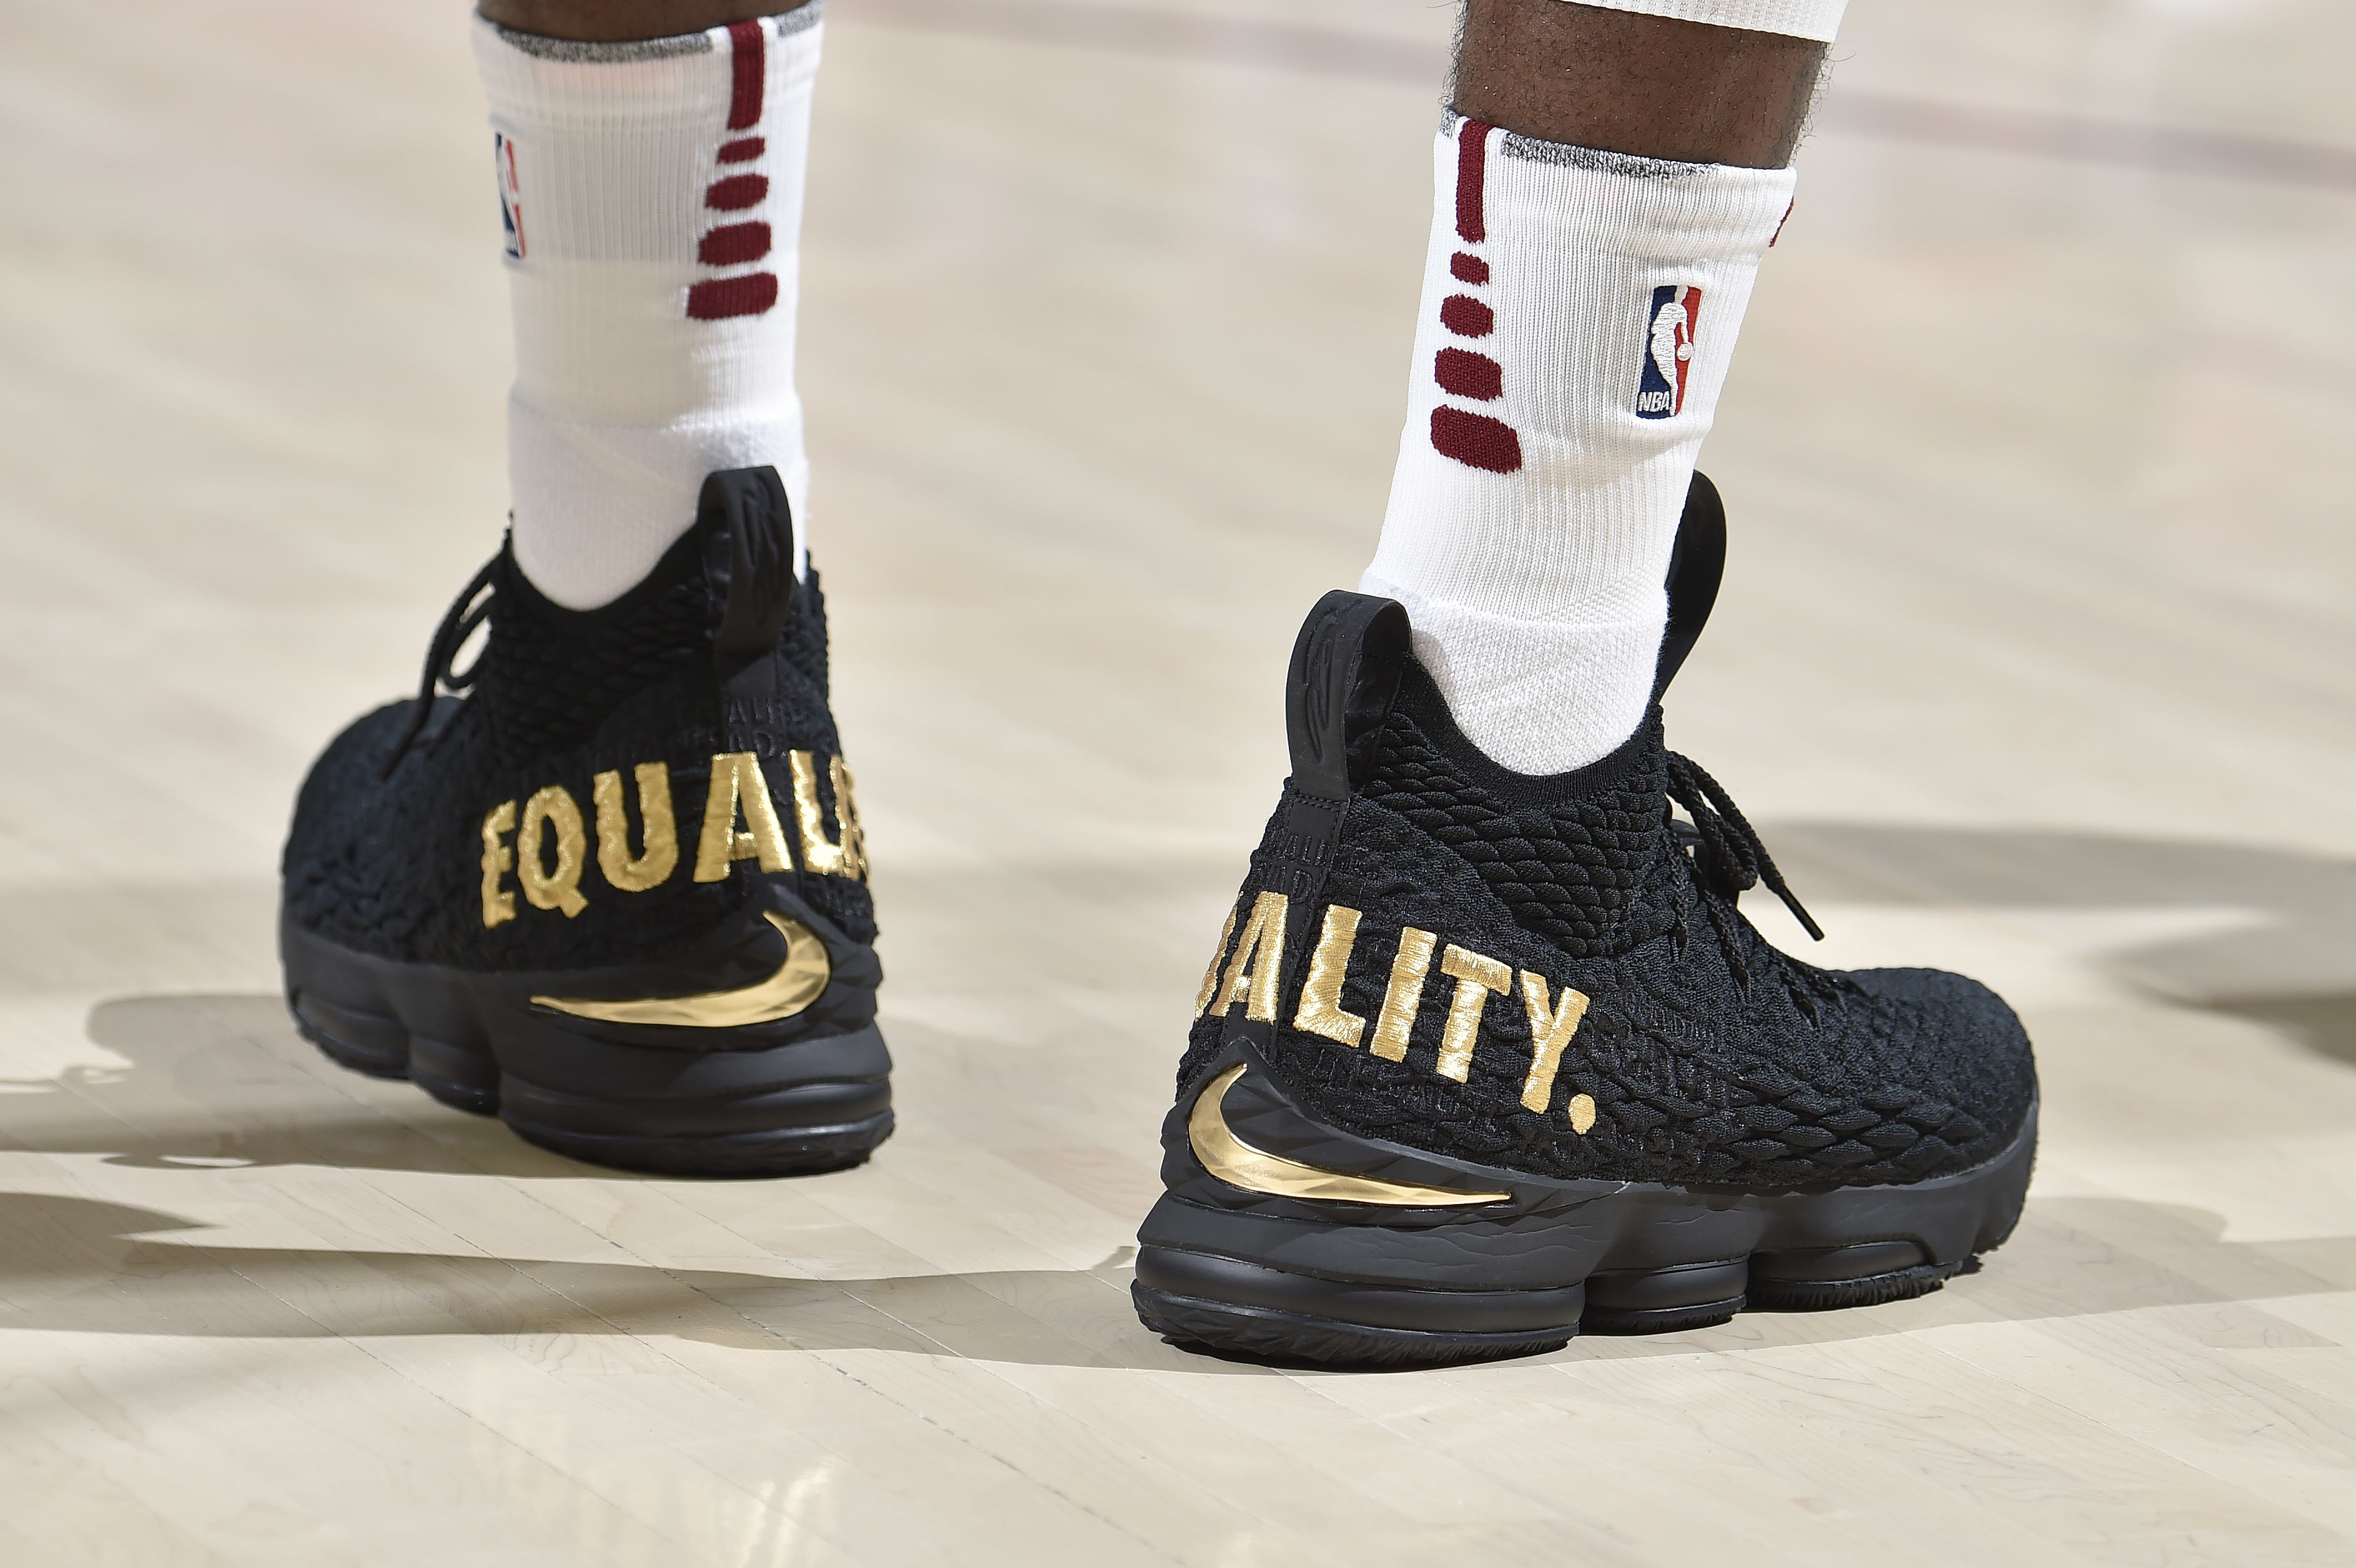 Nike LeBron 15 'Equality' PE 2